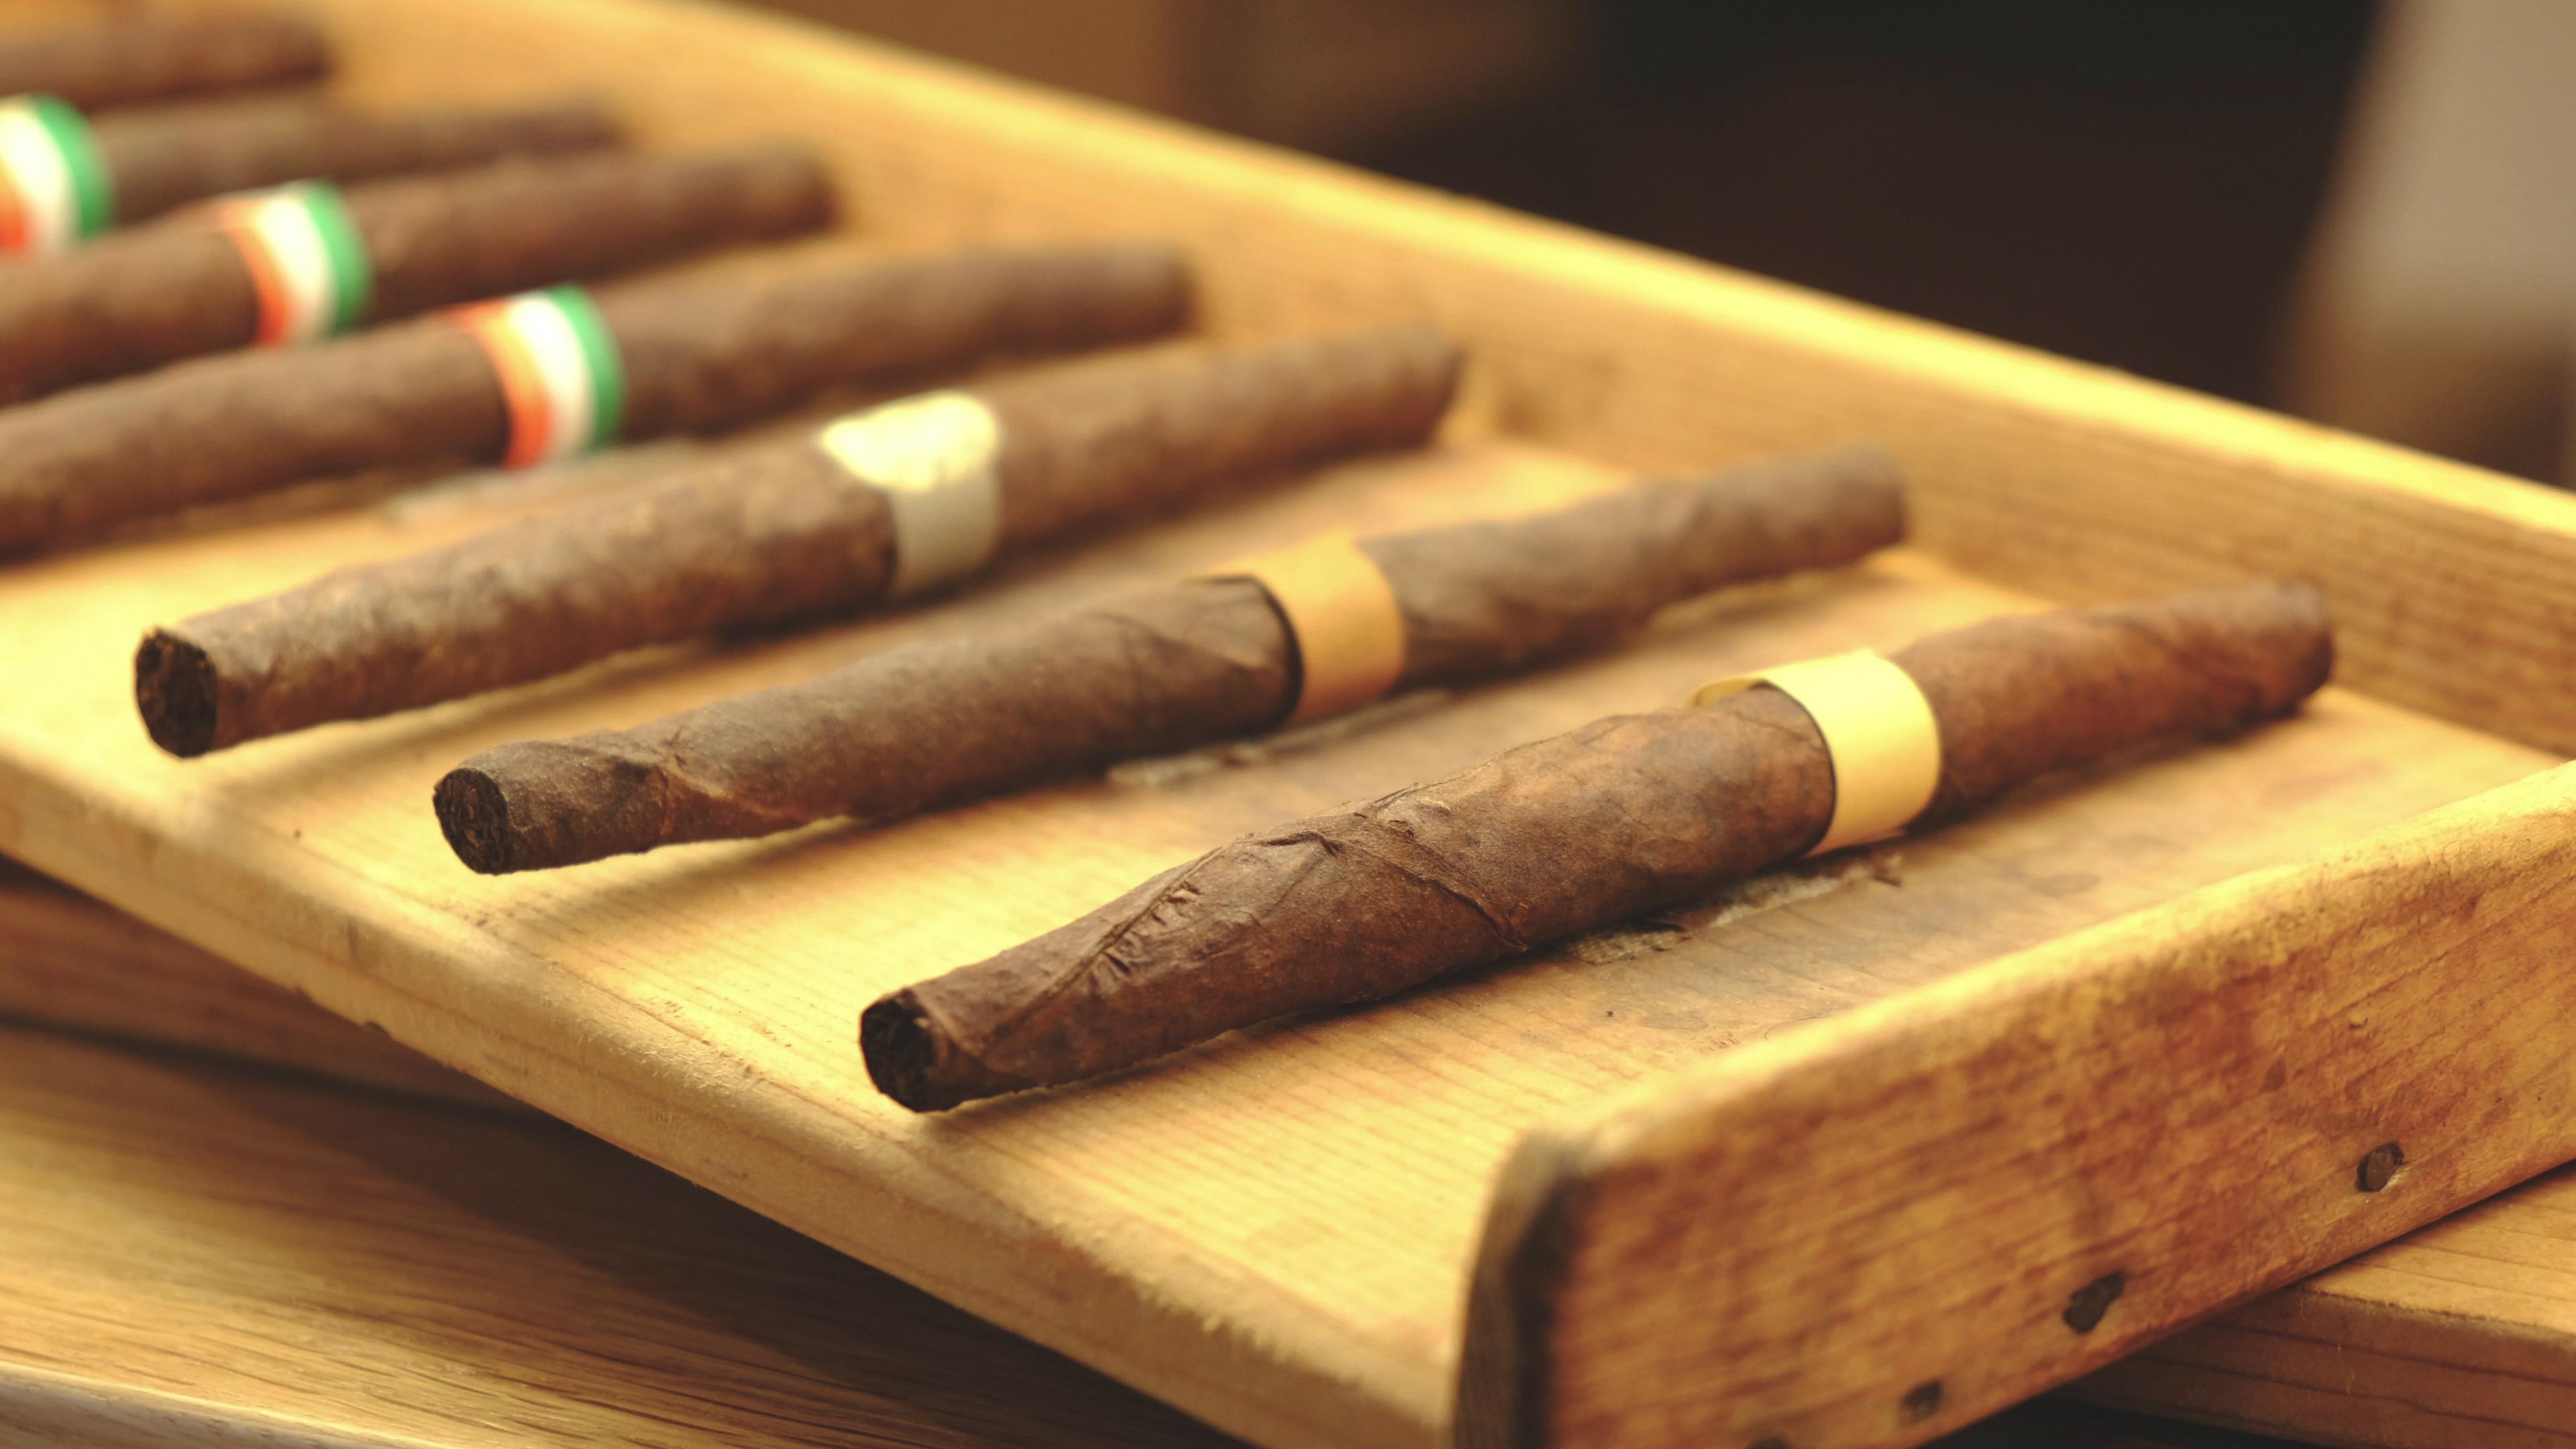 Sigaro Toscano Classico - a classic italian cigar